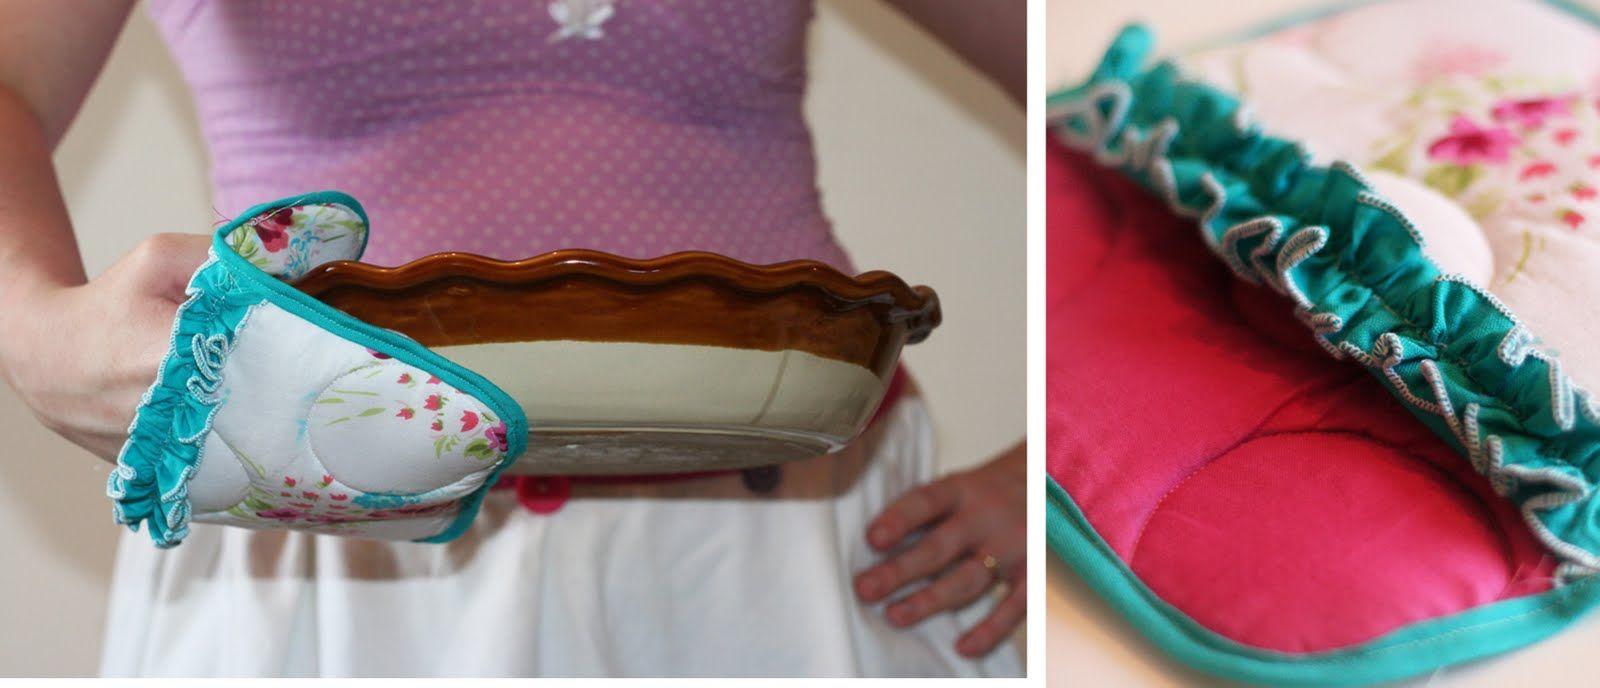 Ruffled Pocket Potholder Tutorial | Jessica Peck